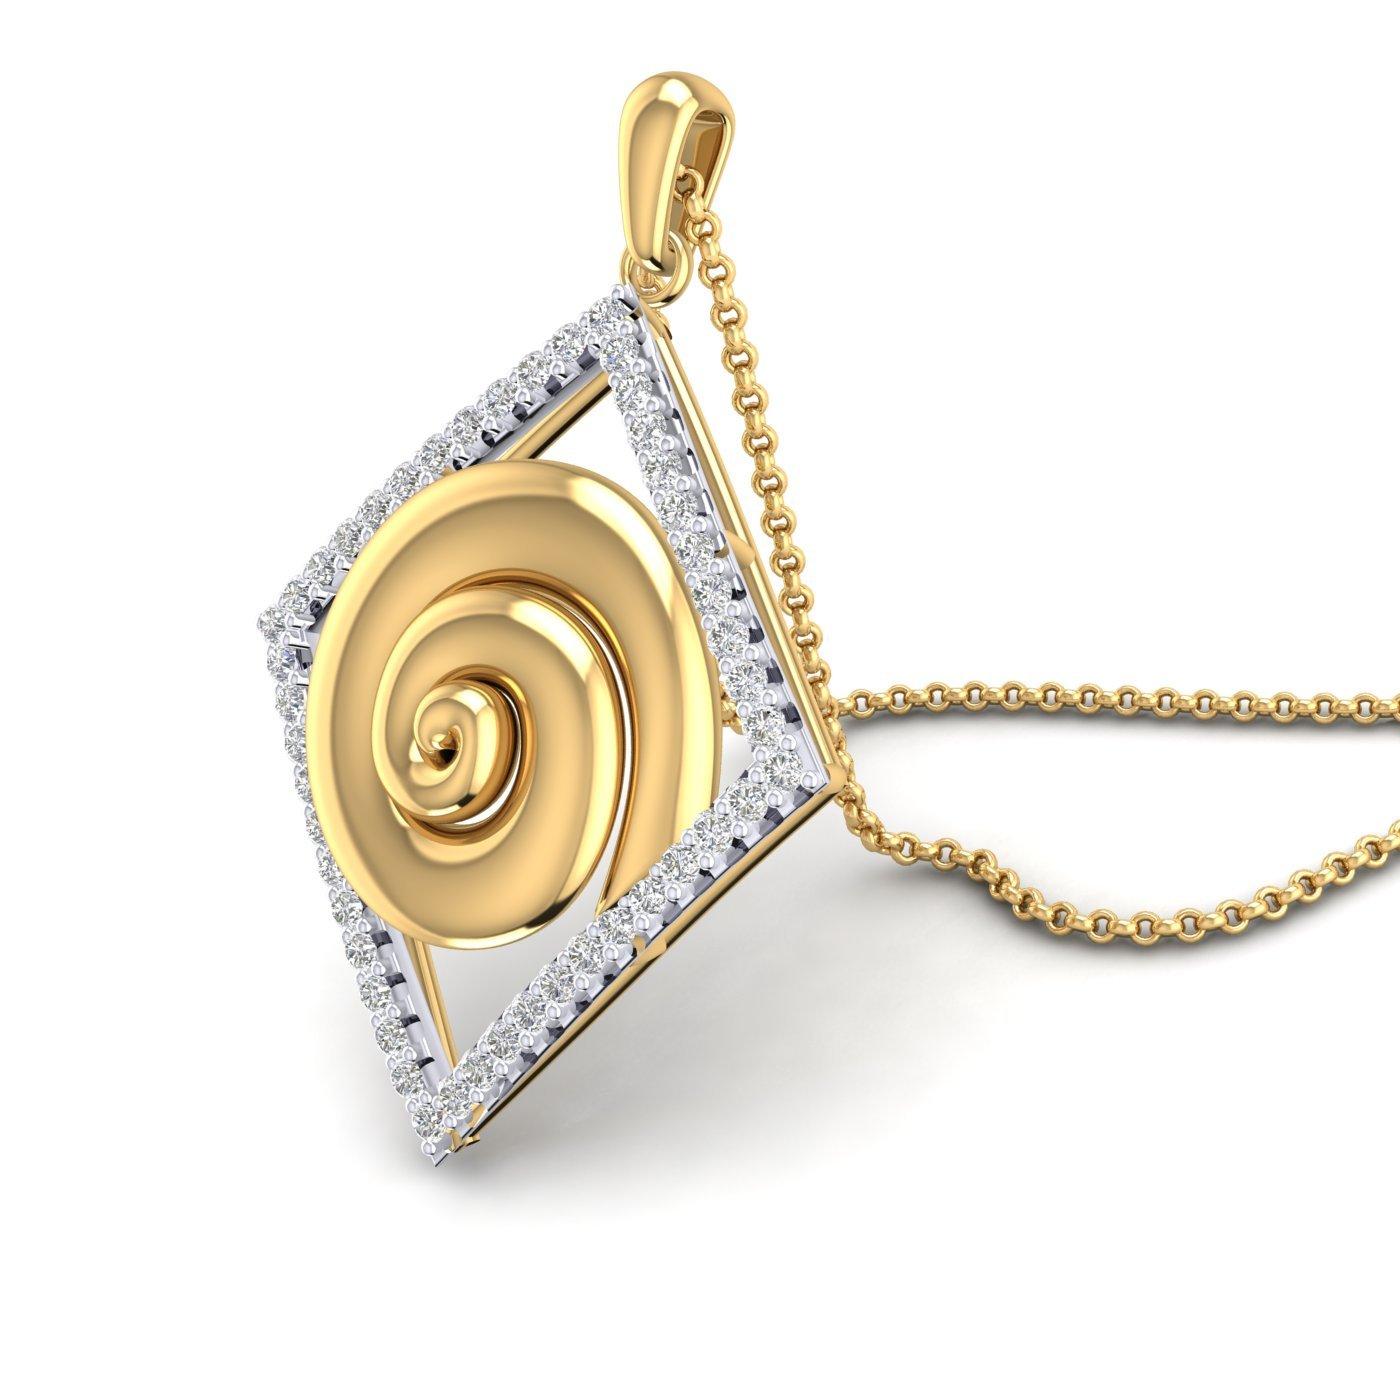 14K Yellow Gold Plated Cubic Zirconia Kite Shape Swirl Design Pendant Fashion Jewelry Summer Sale